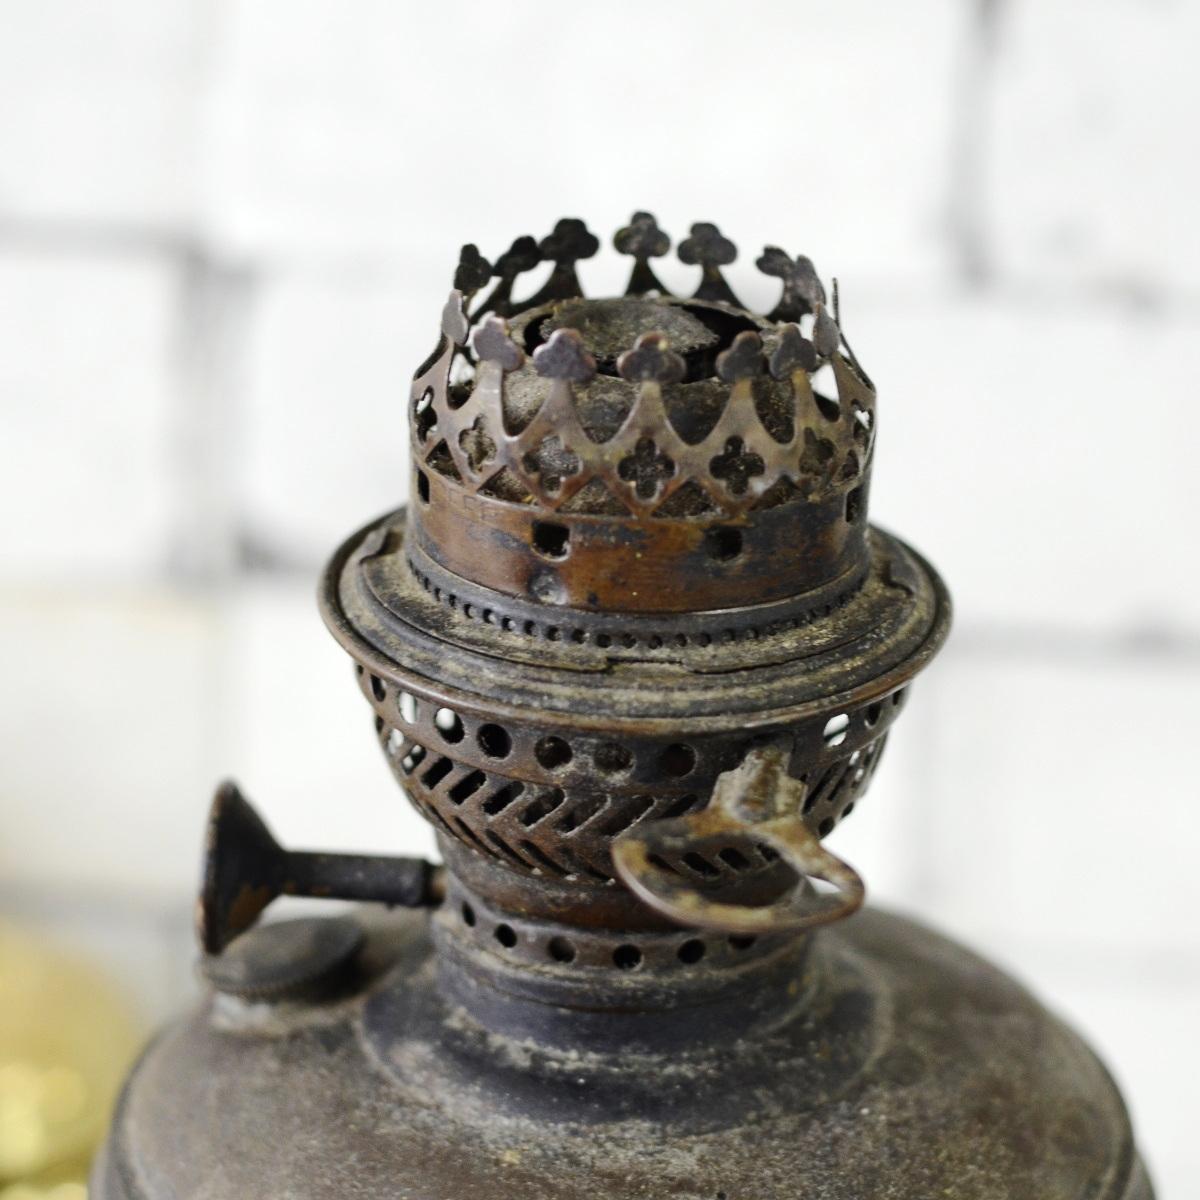 Antikcart Antique 1 Foot Metal Kerosene Lamp Decor Collectible Top View Antikcart